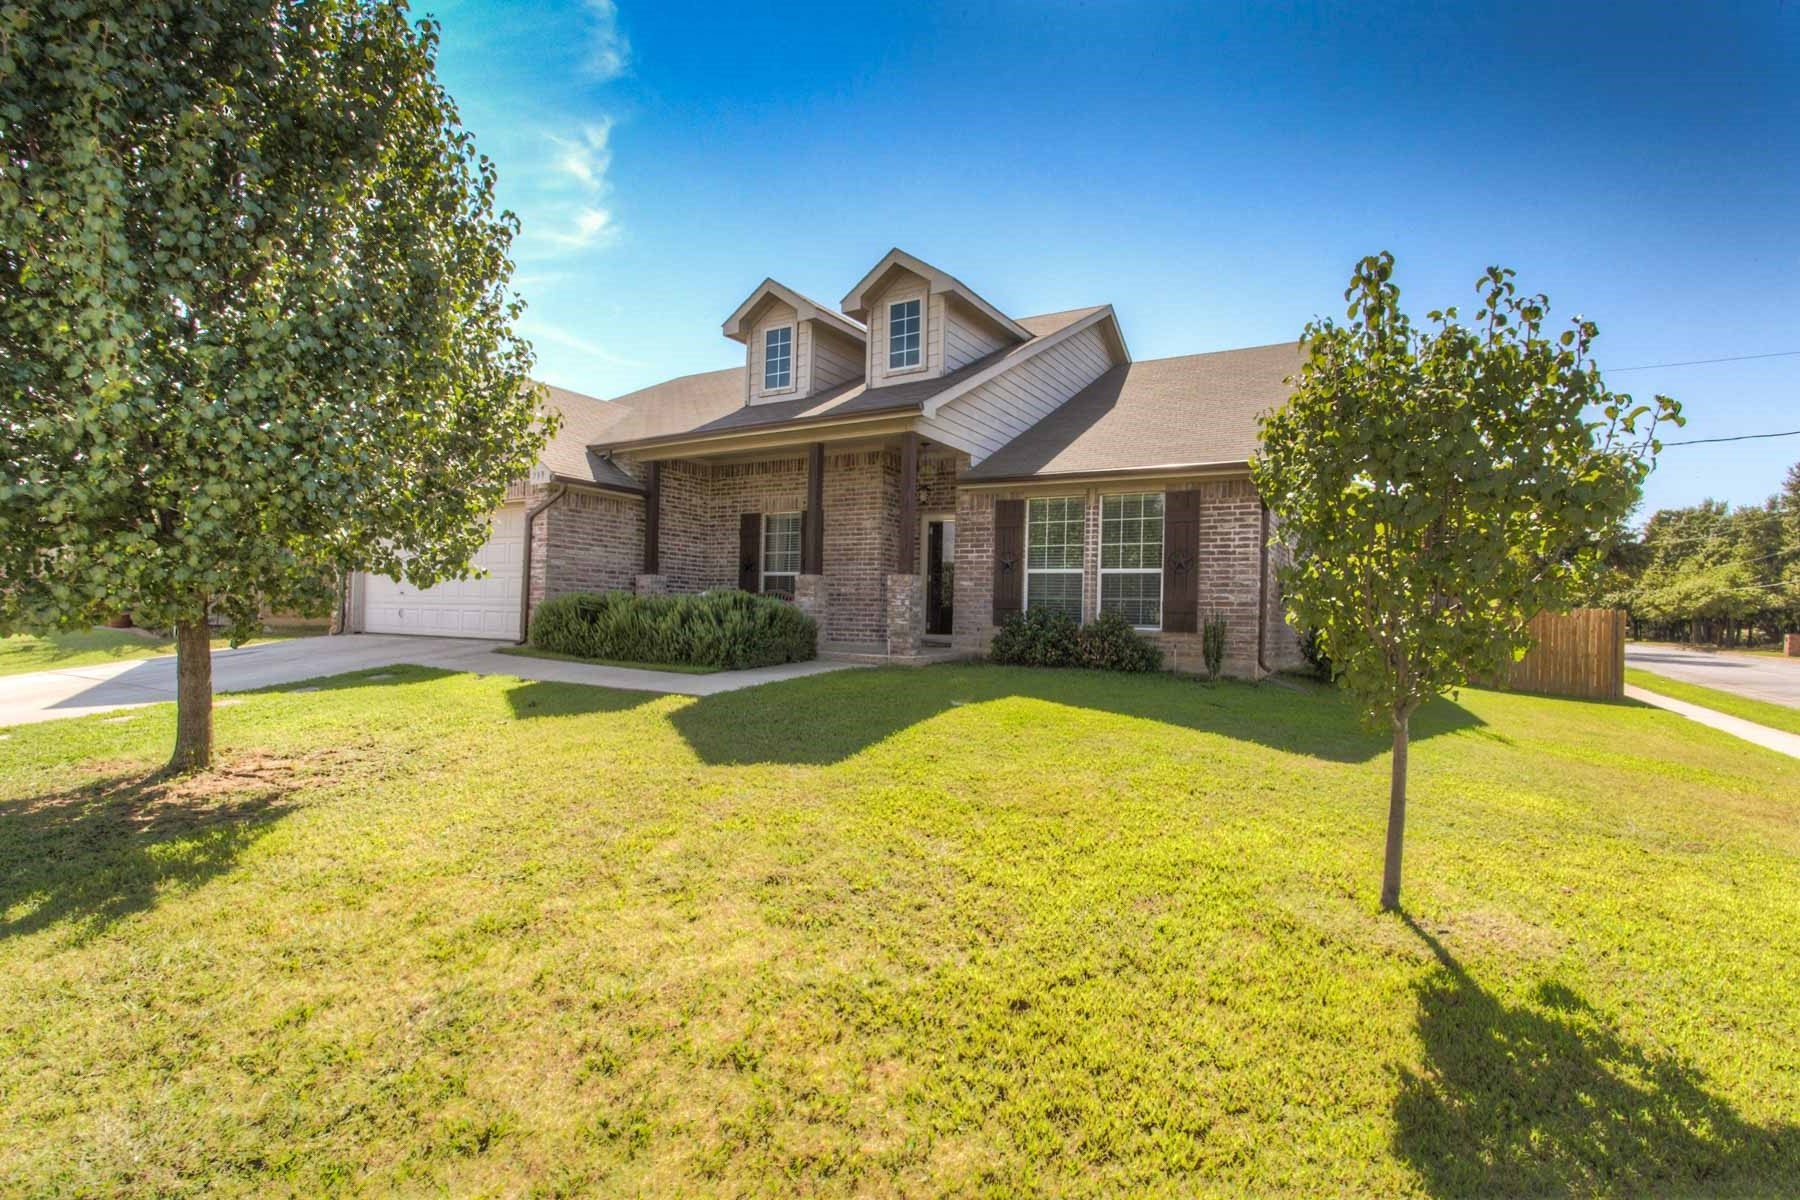 Villa per Vendita alle ore Urban Azle Living on Corner Lot 739 Tracy Drive Azle, Texas, 76020 Stati Uniti